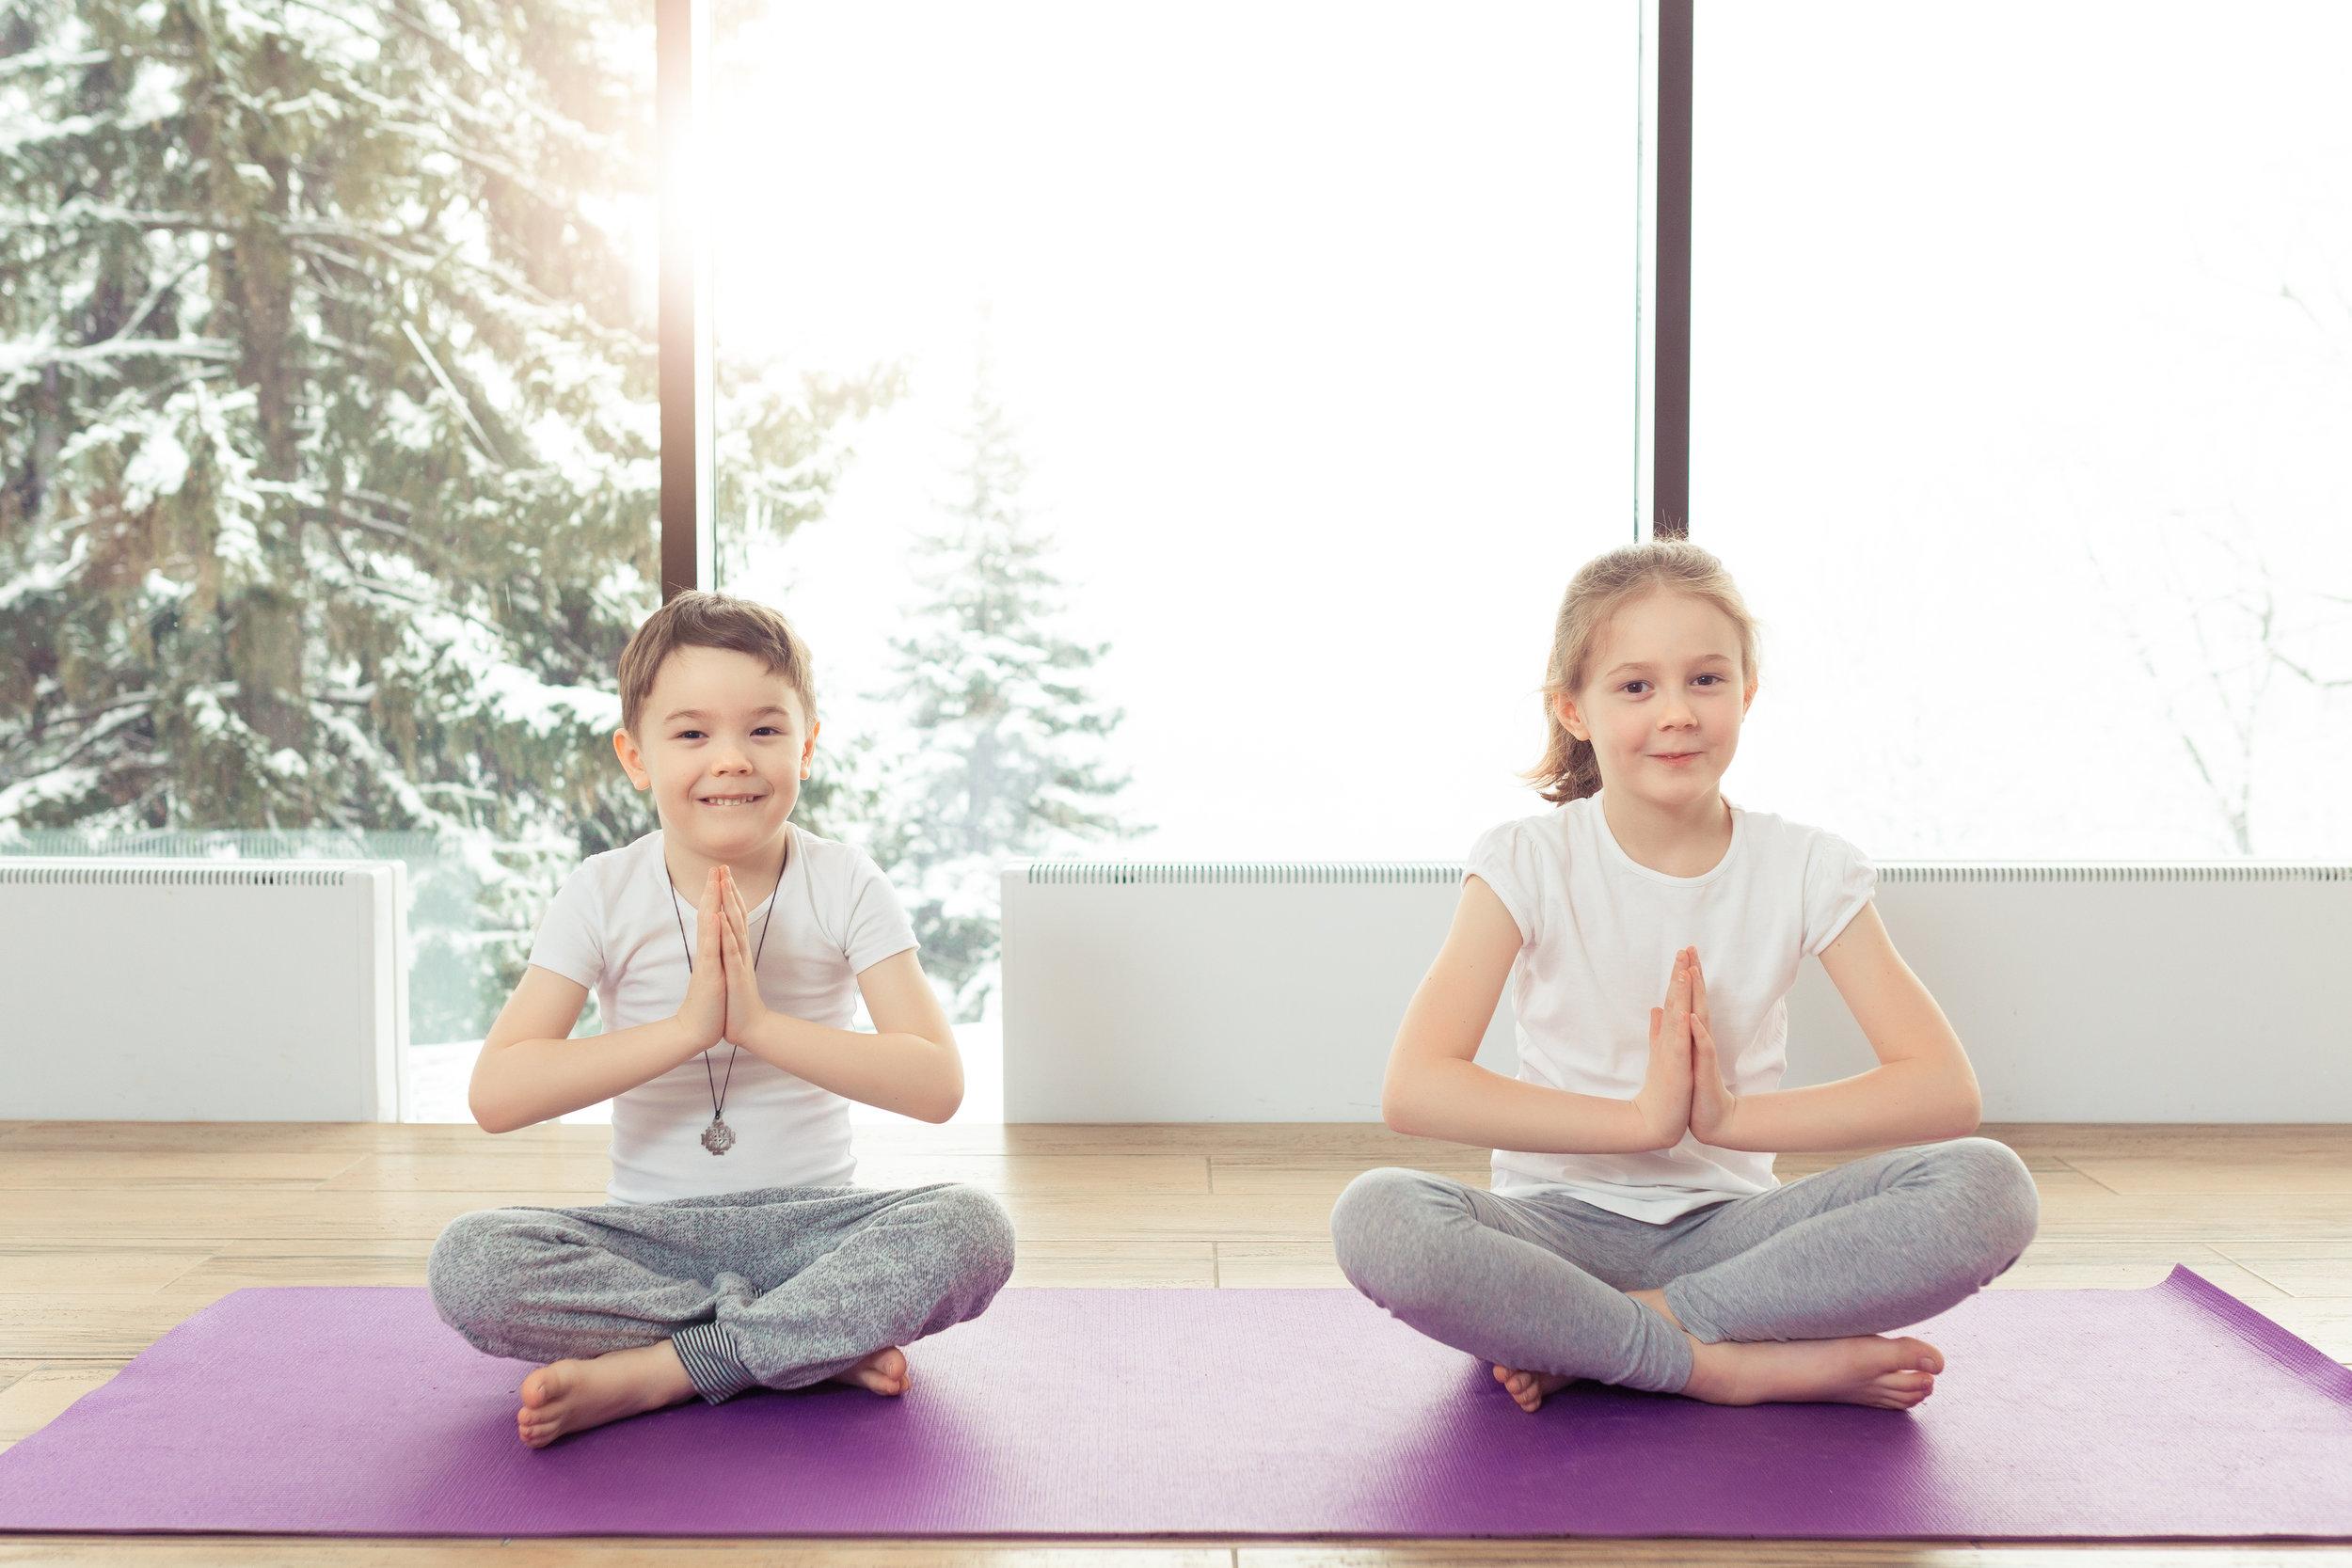 Kids & Littles - Mindfulness & Creative Yoga,Emotion Expression Psychotherapeutic YogaMindfulness Classes & ProgrammingTrauma Sensitive Yoga ClassesBrain Injury Yoga Classes